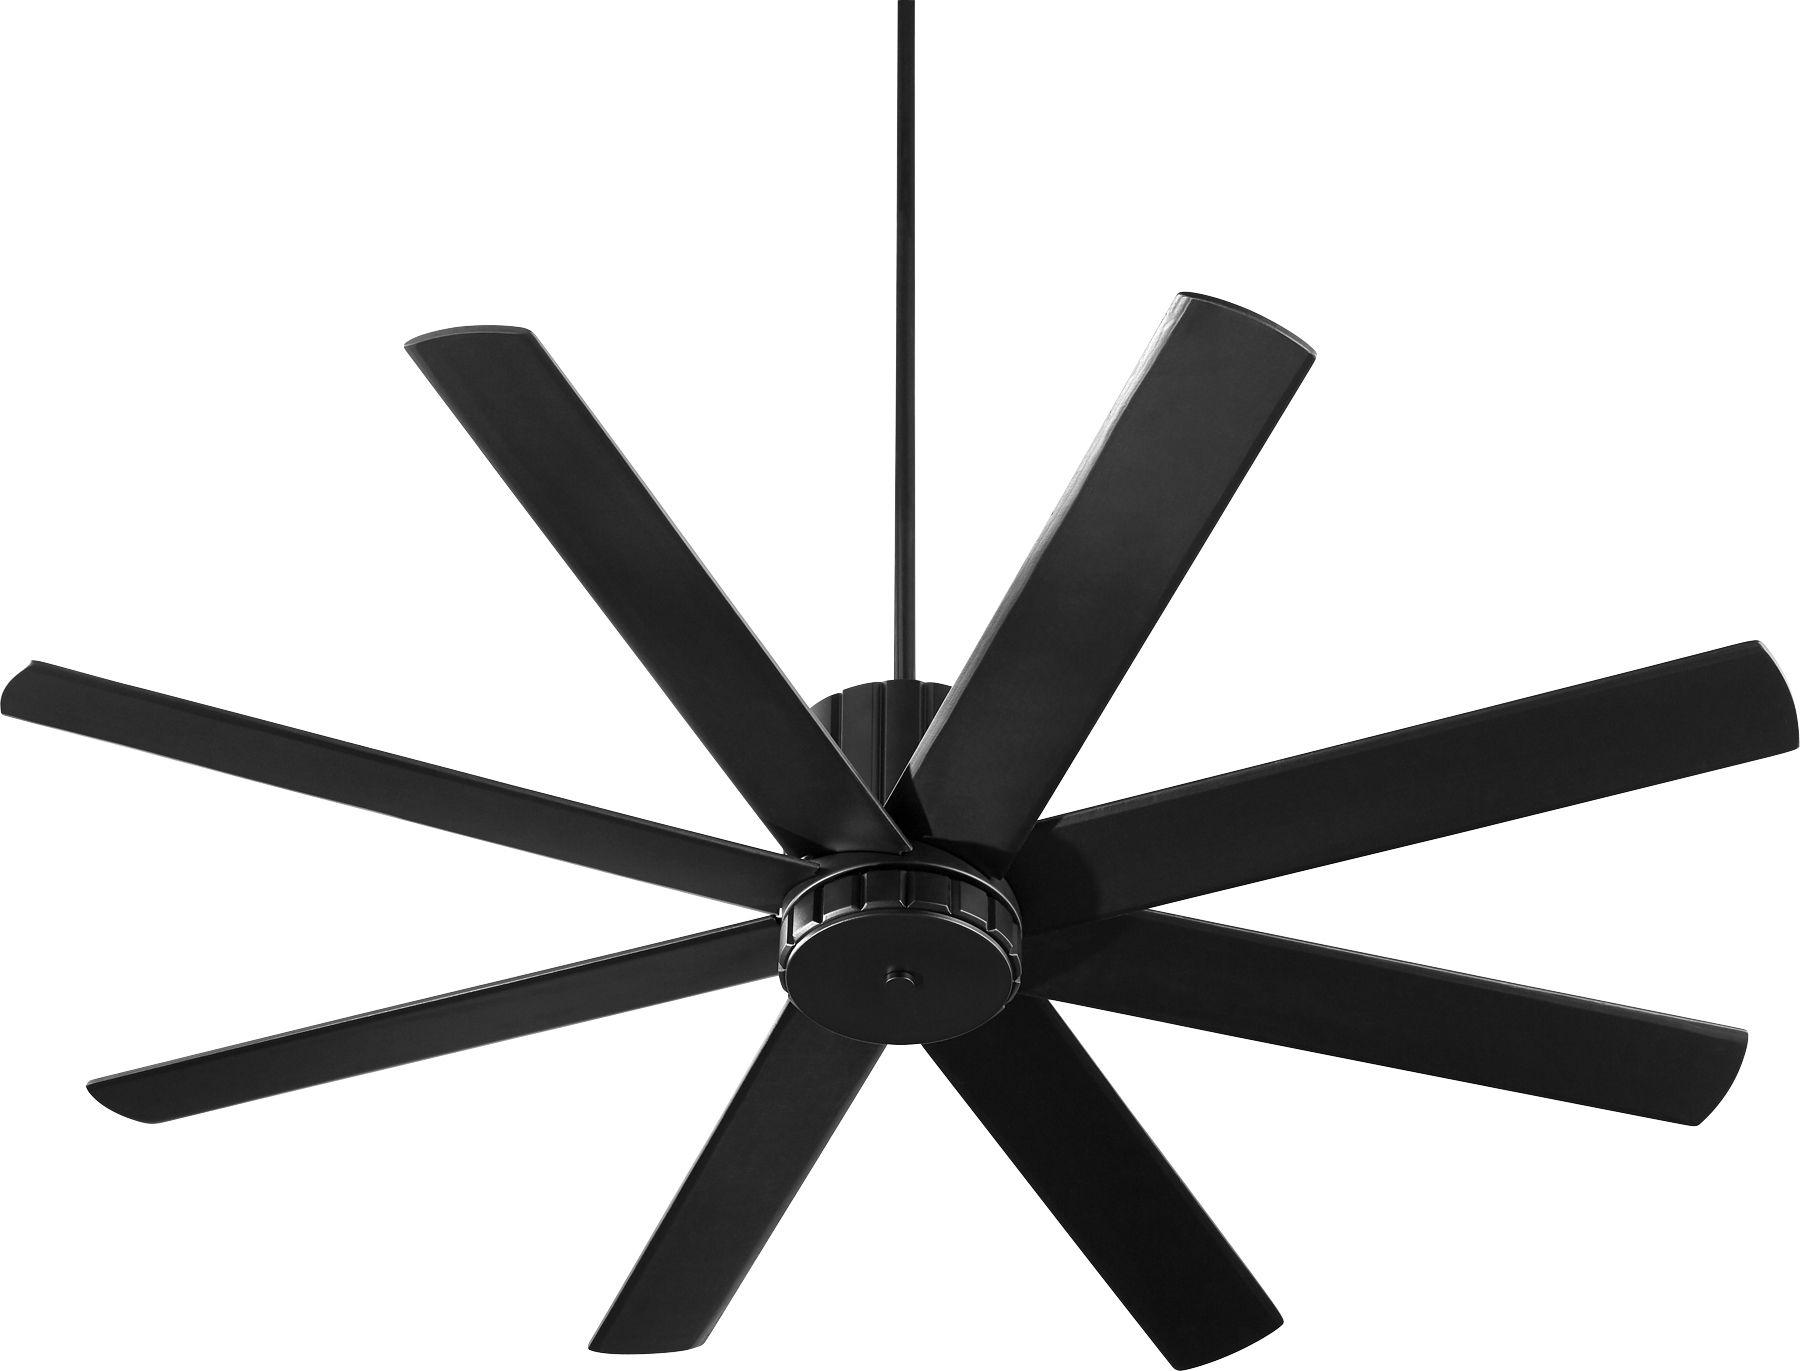 Quorum Ceiling Fan Wiring Diagram | Wiring Diagram on ceiling fans with lights wiring diagrams, hunter ceiling fans wiring diagrams, honeywell ceiling fans wiring diagrams,